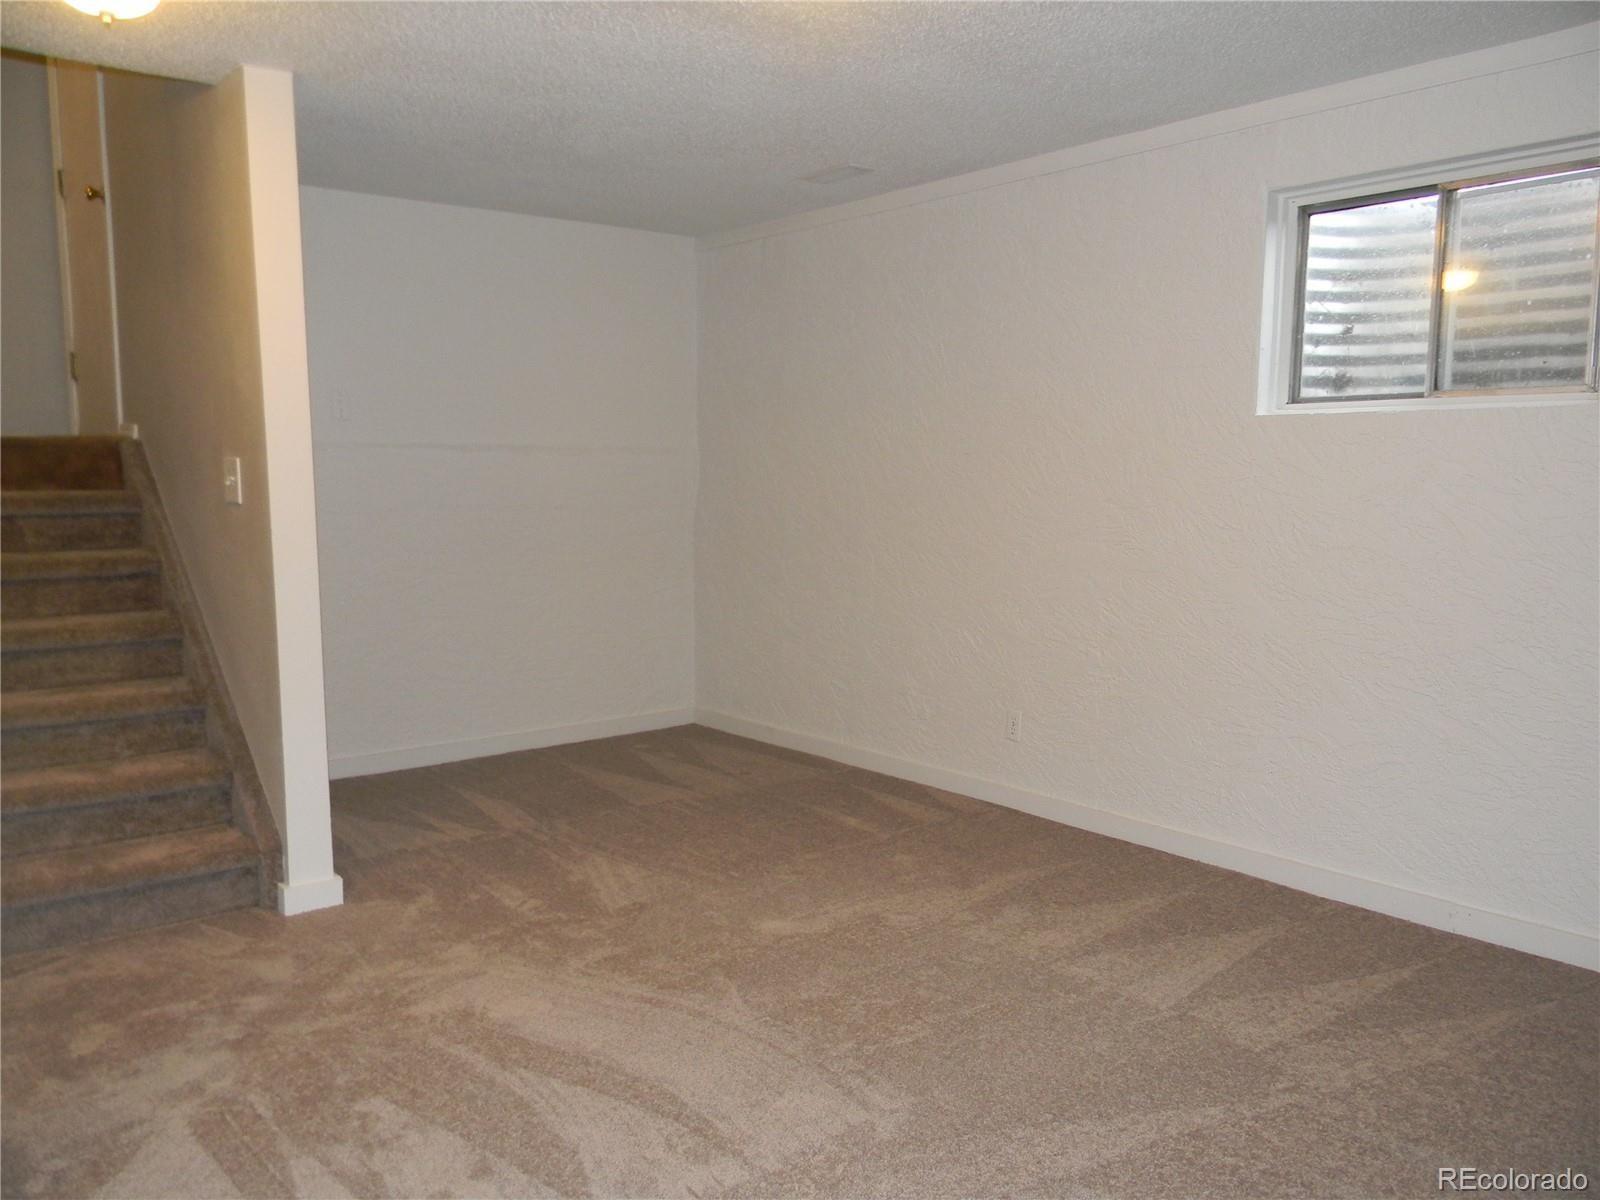 MLS# 5946356 - 21 - 4920 Ridenour Drive, Colorado Springs, CO 80916